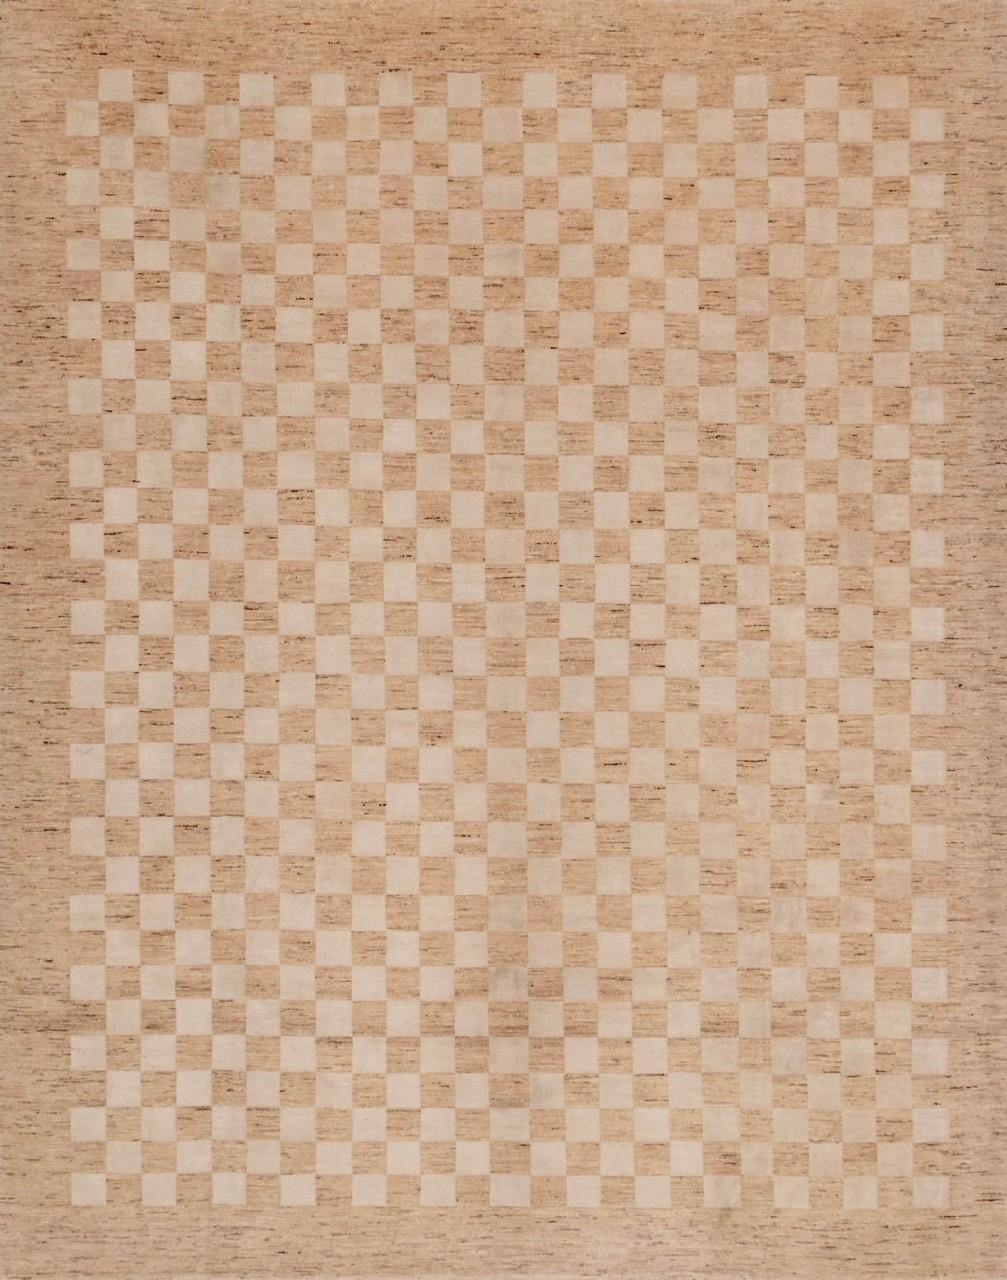 Gabbeh-Teppich Chessboard